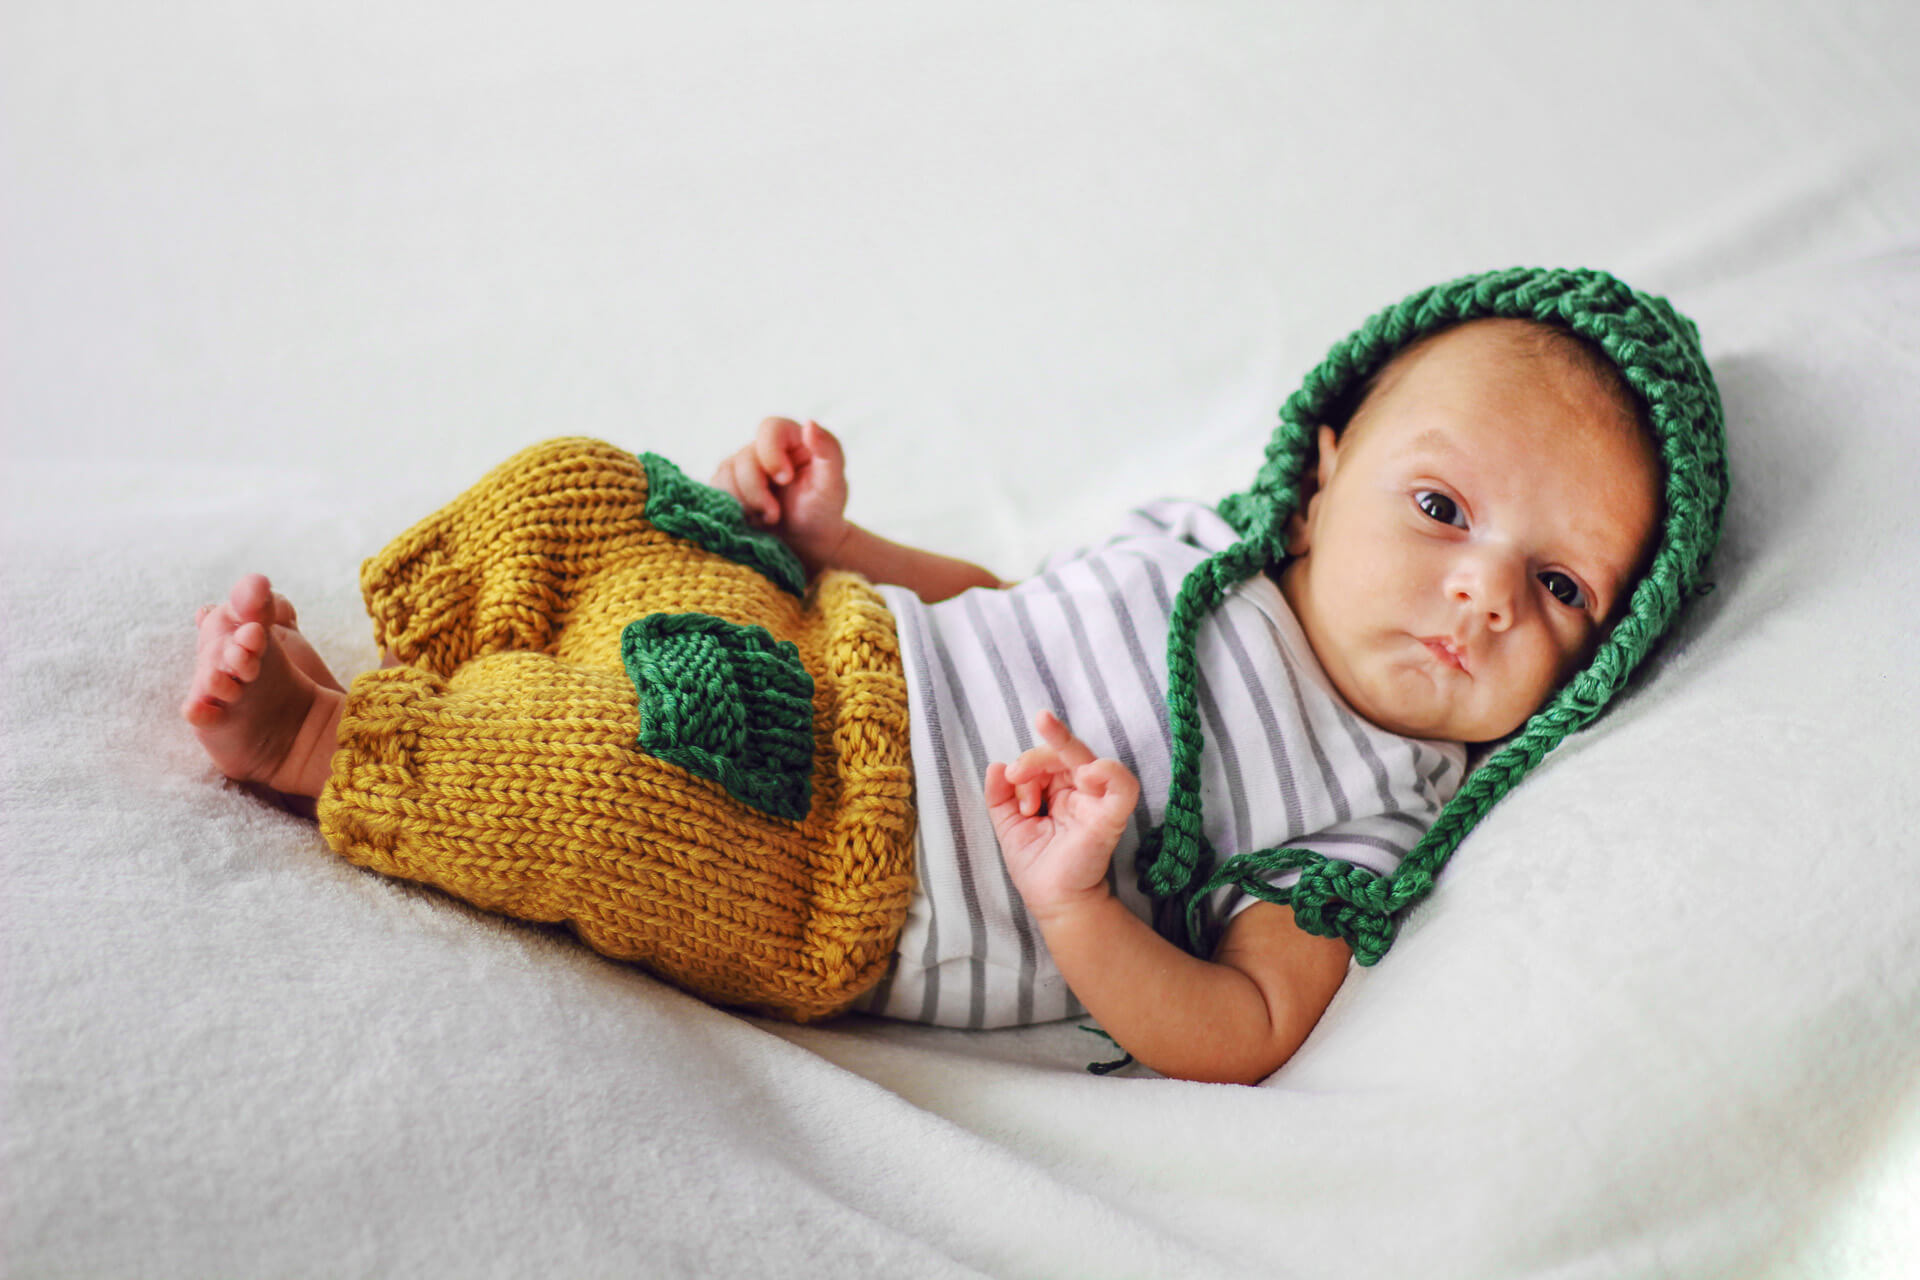 Novorodenecké fotenie bábätka od Fotografky v Nových Zámkoch - Kitti Photo